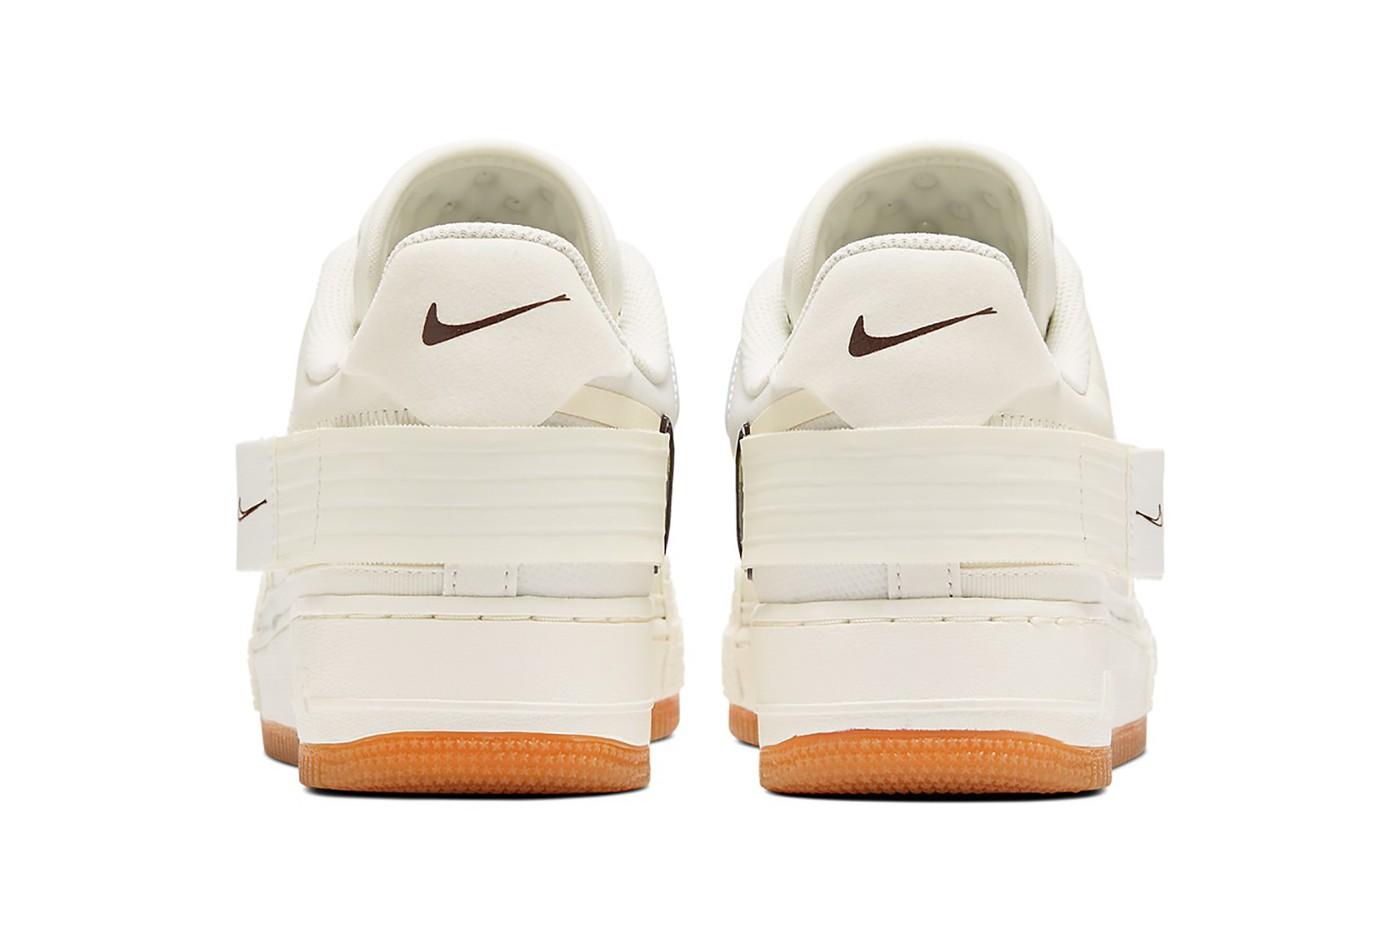 nike air force 1 type n354 sneakers cream white colorway release